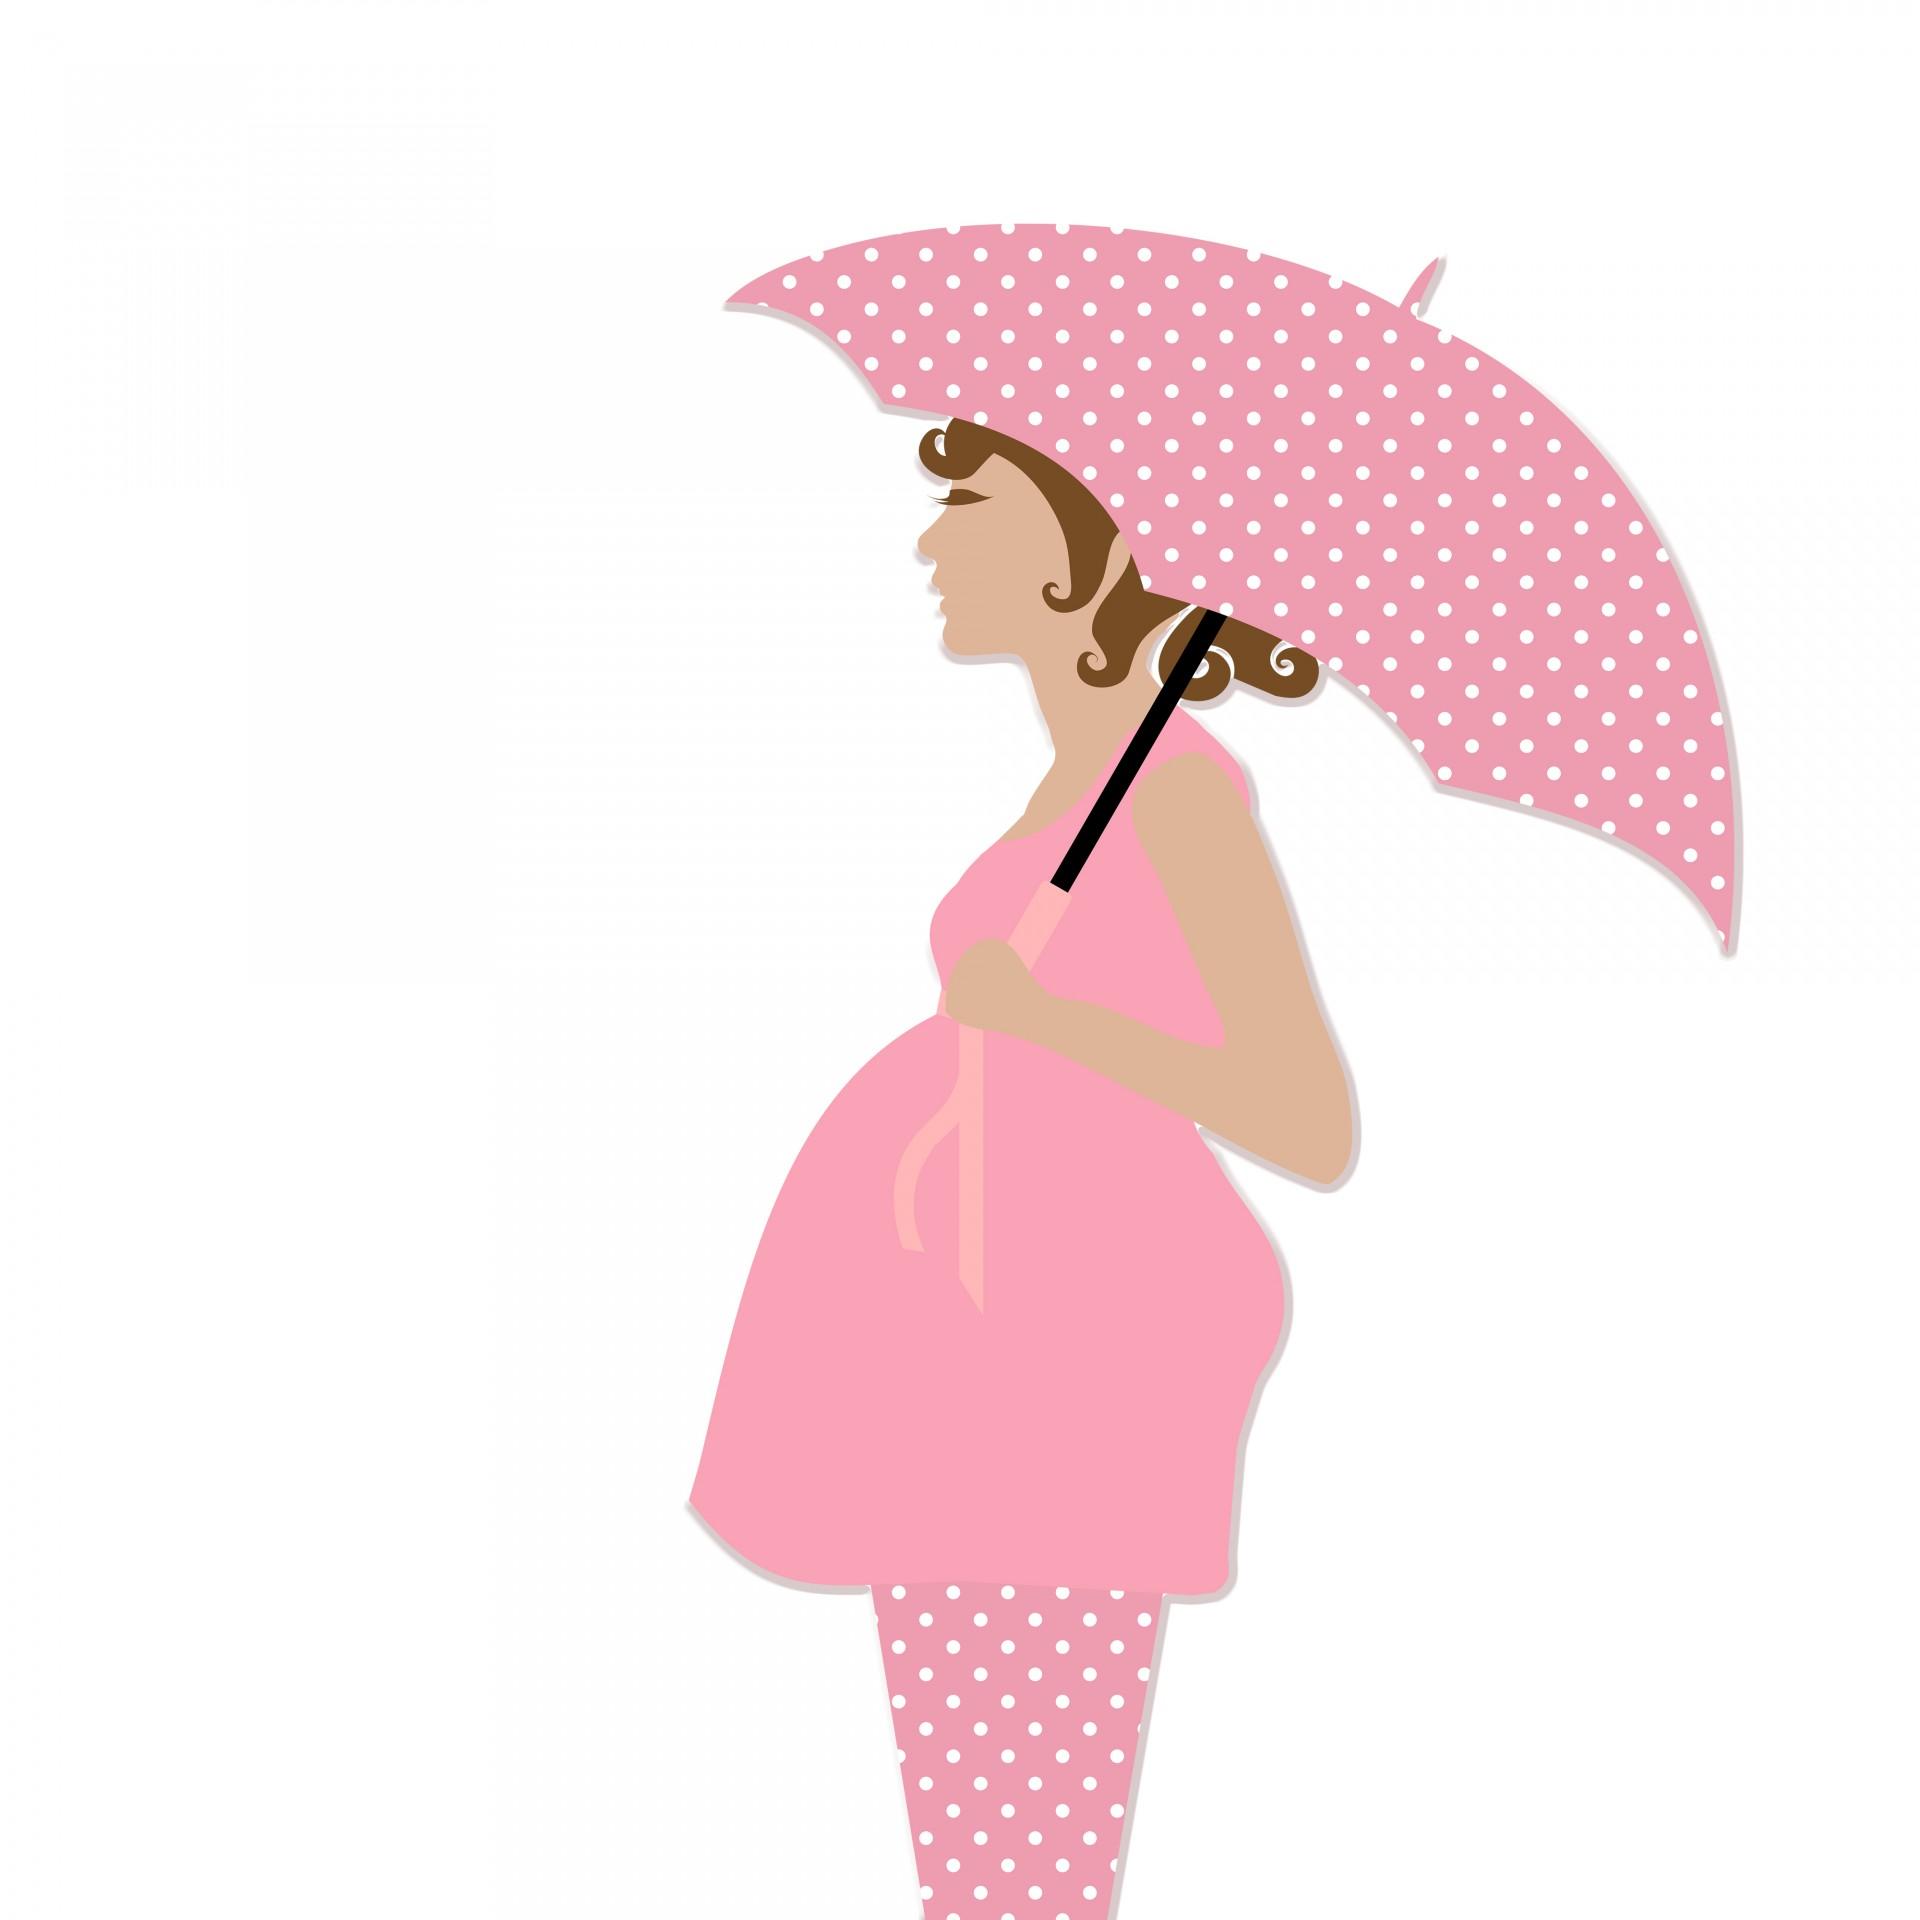 Clipart Pregnant Woman .